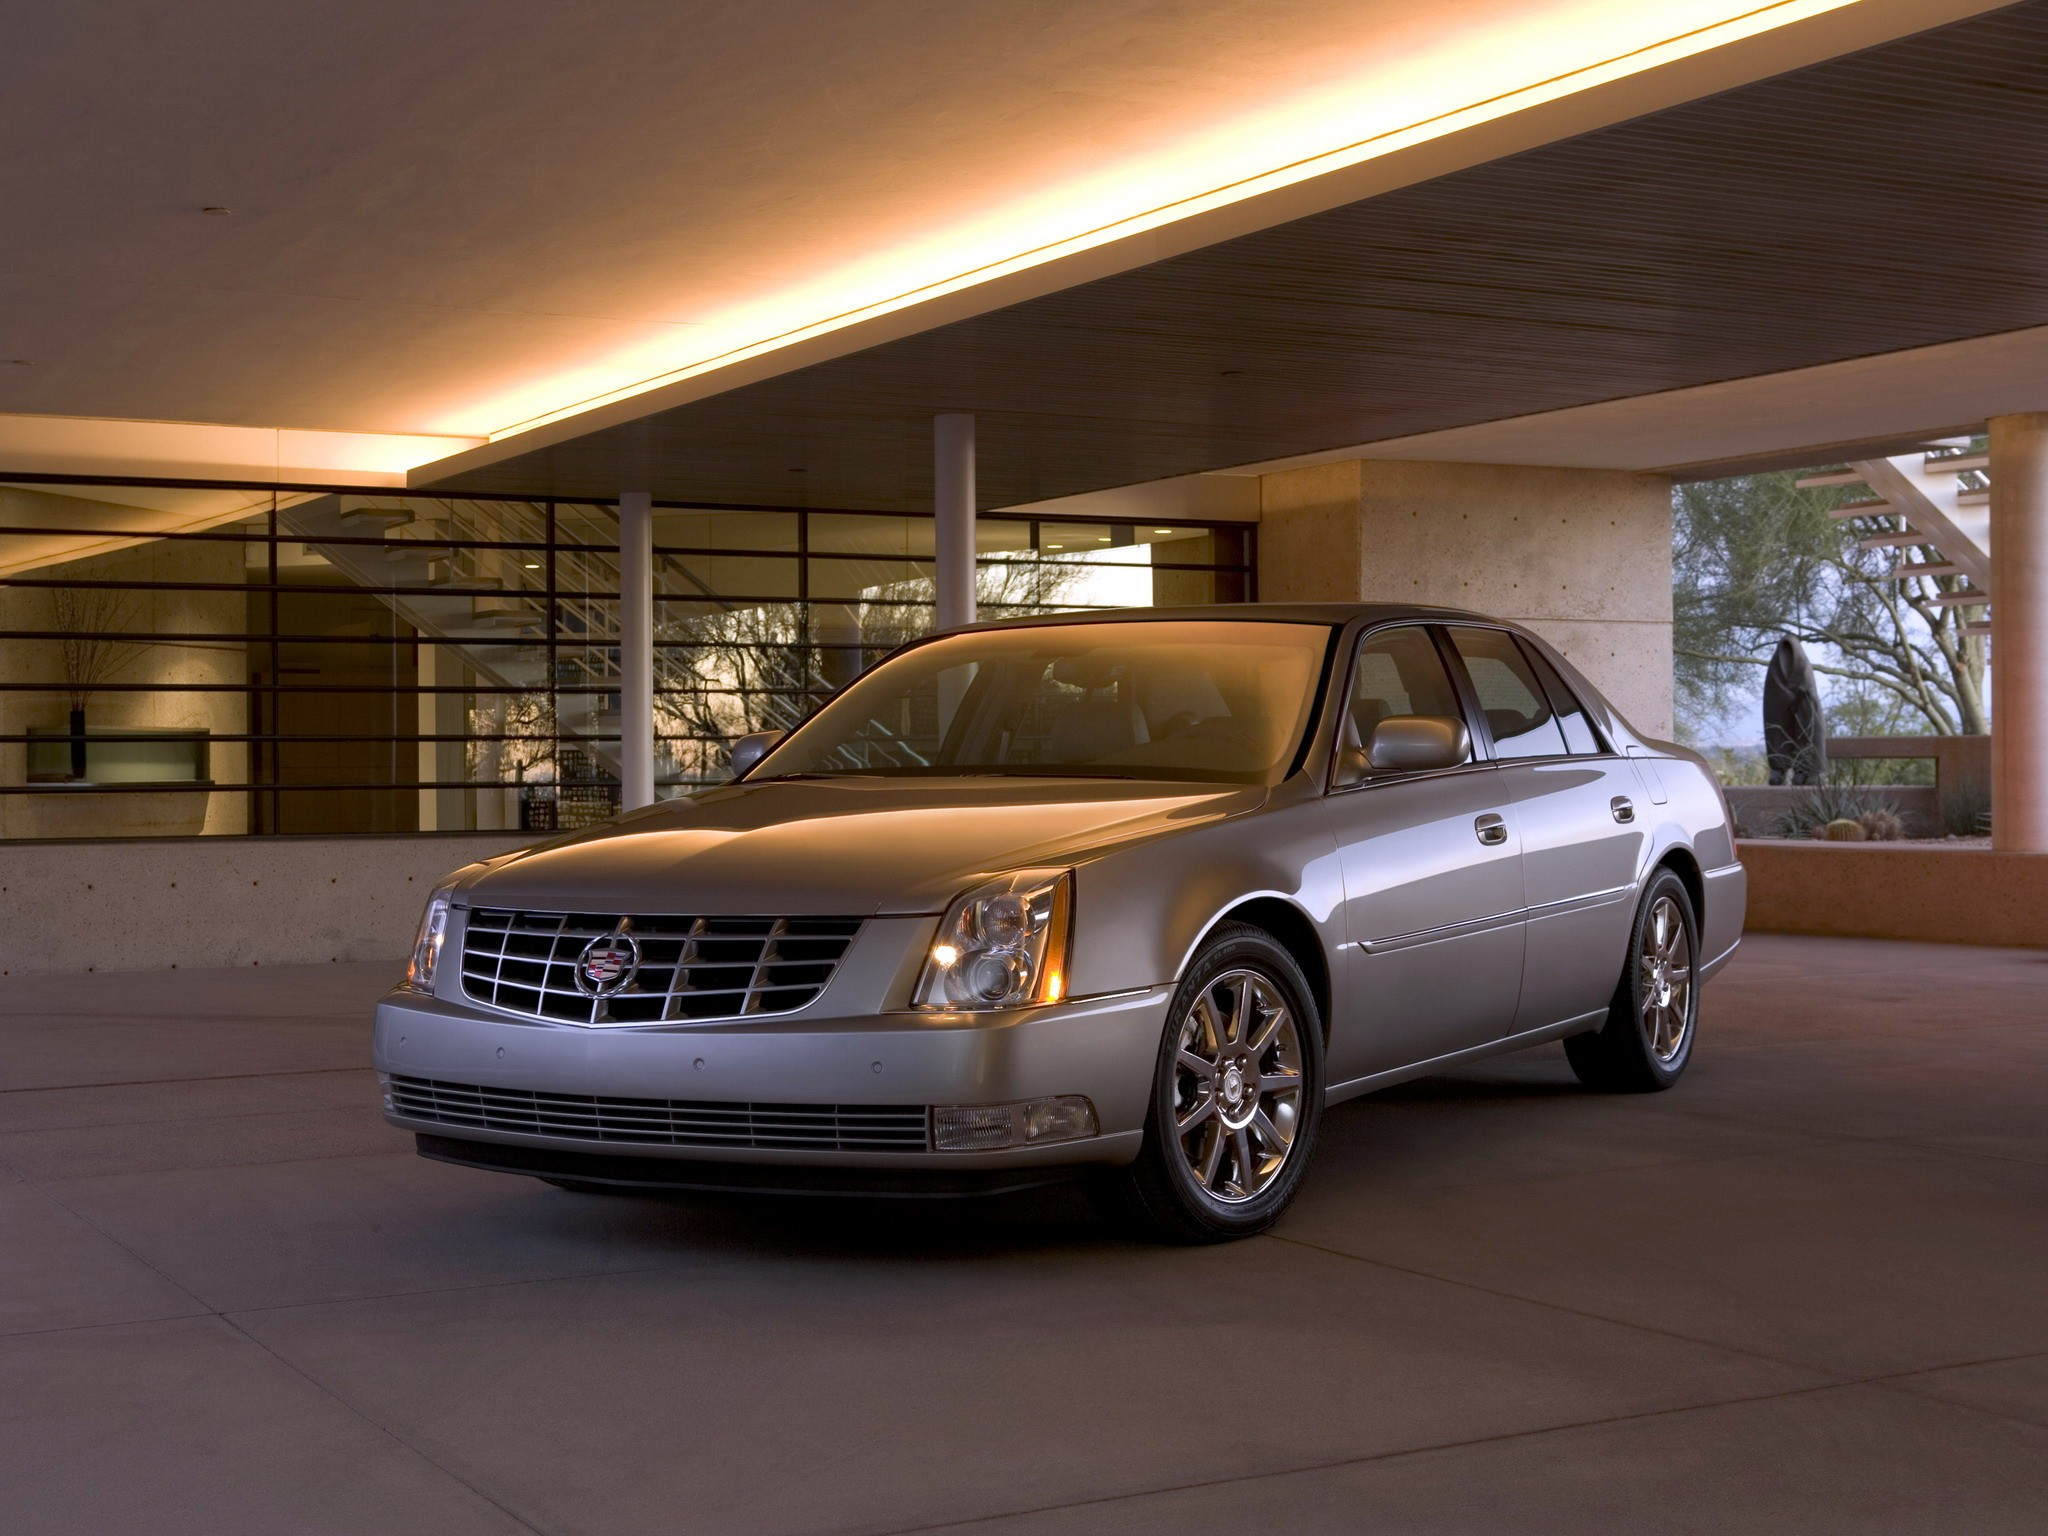 Cadillac Dts Specs 2008 2009 2010 2011 Autoevolution